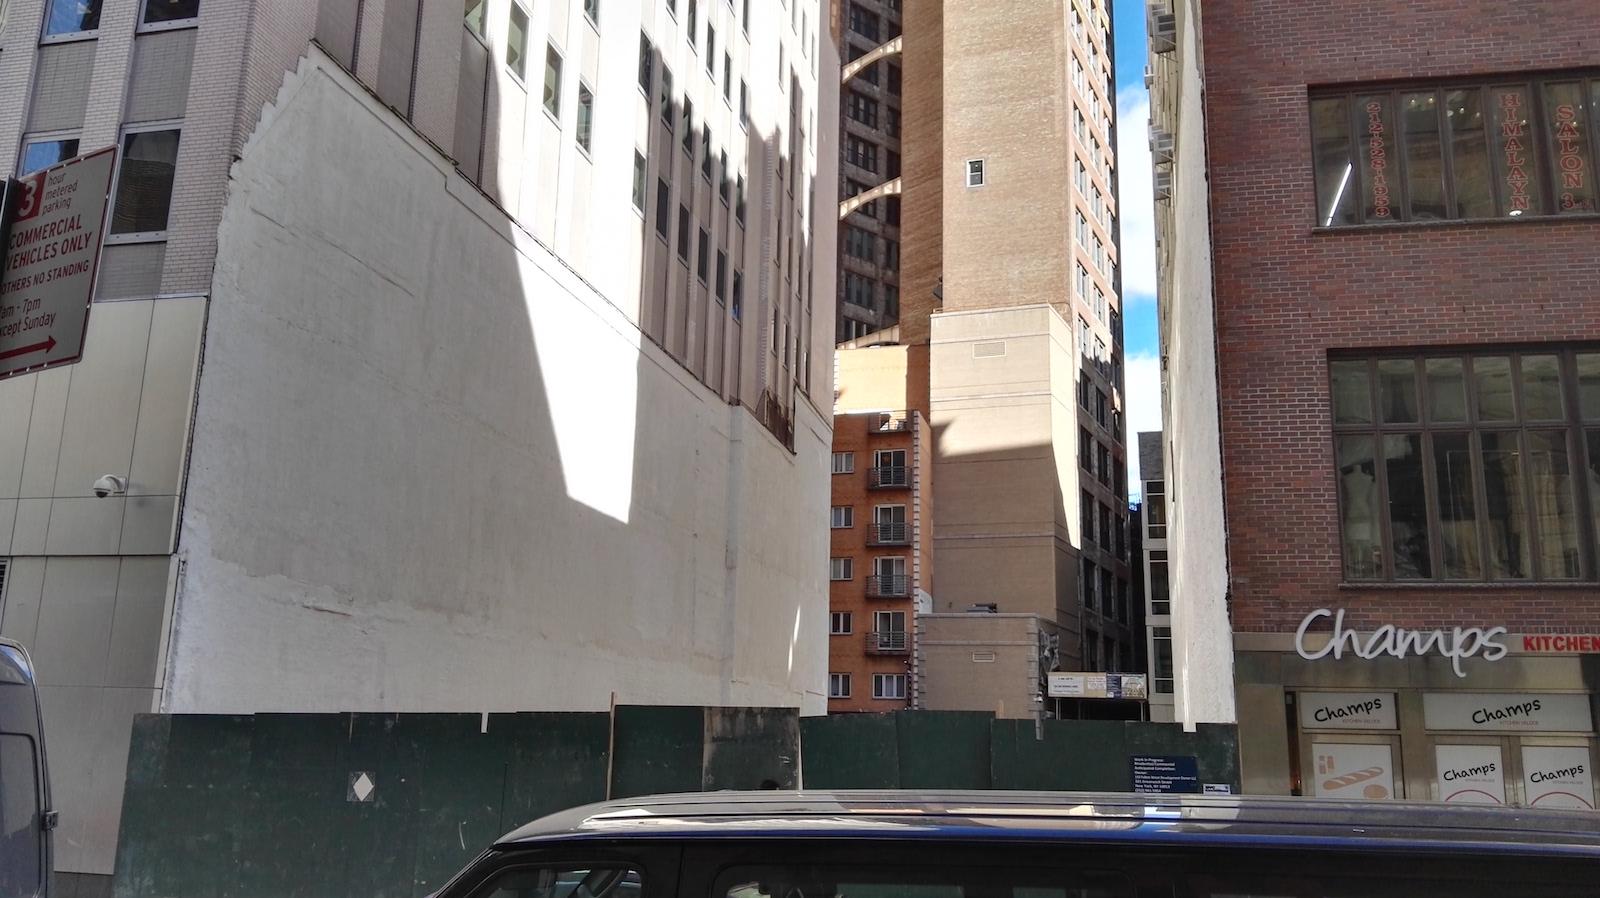 143 Fulton Street construction site. Photo courtesy YIMBY reader Rich Brome.